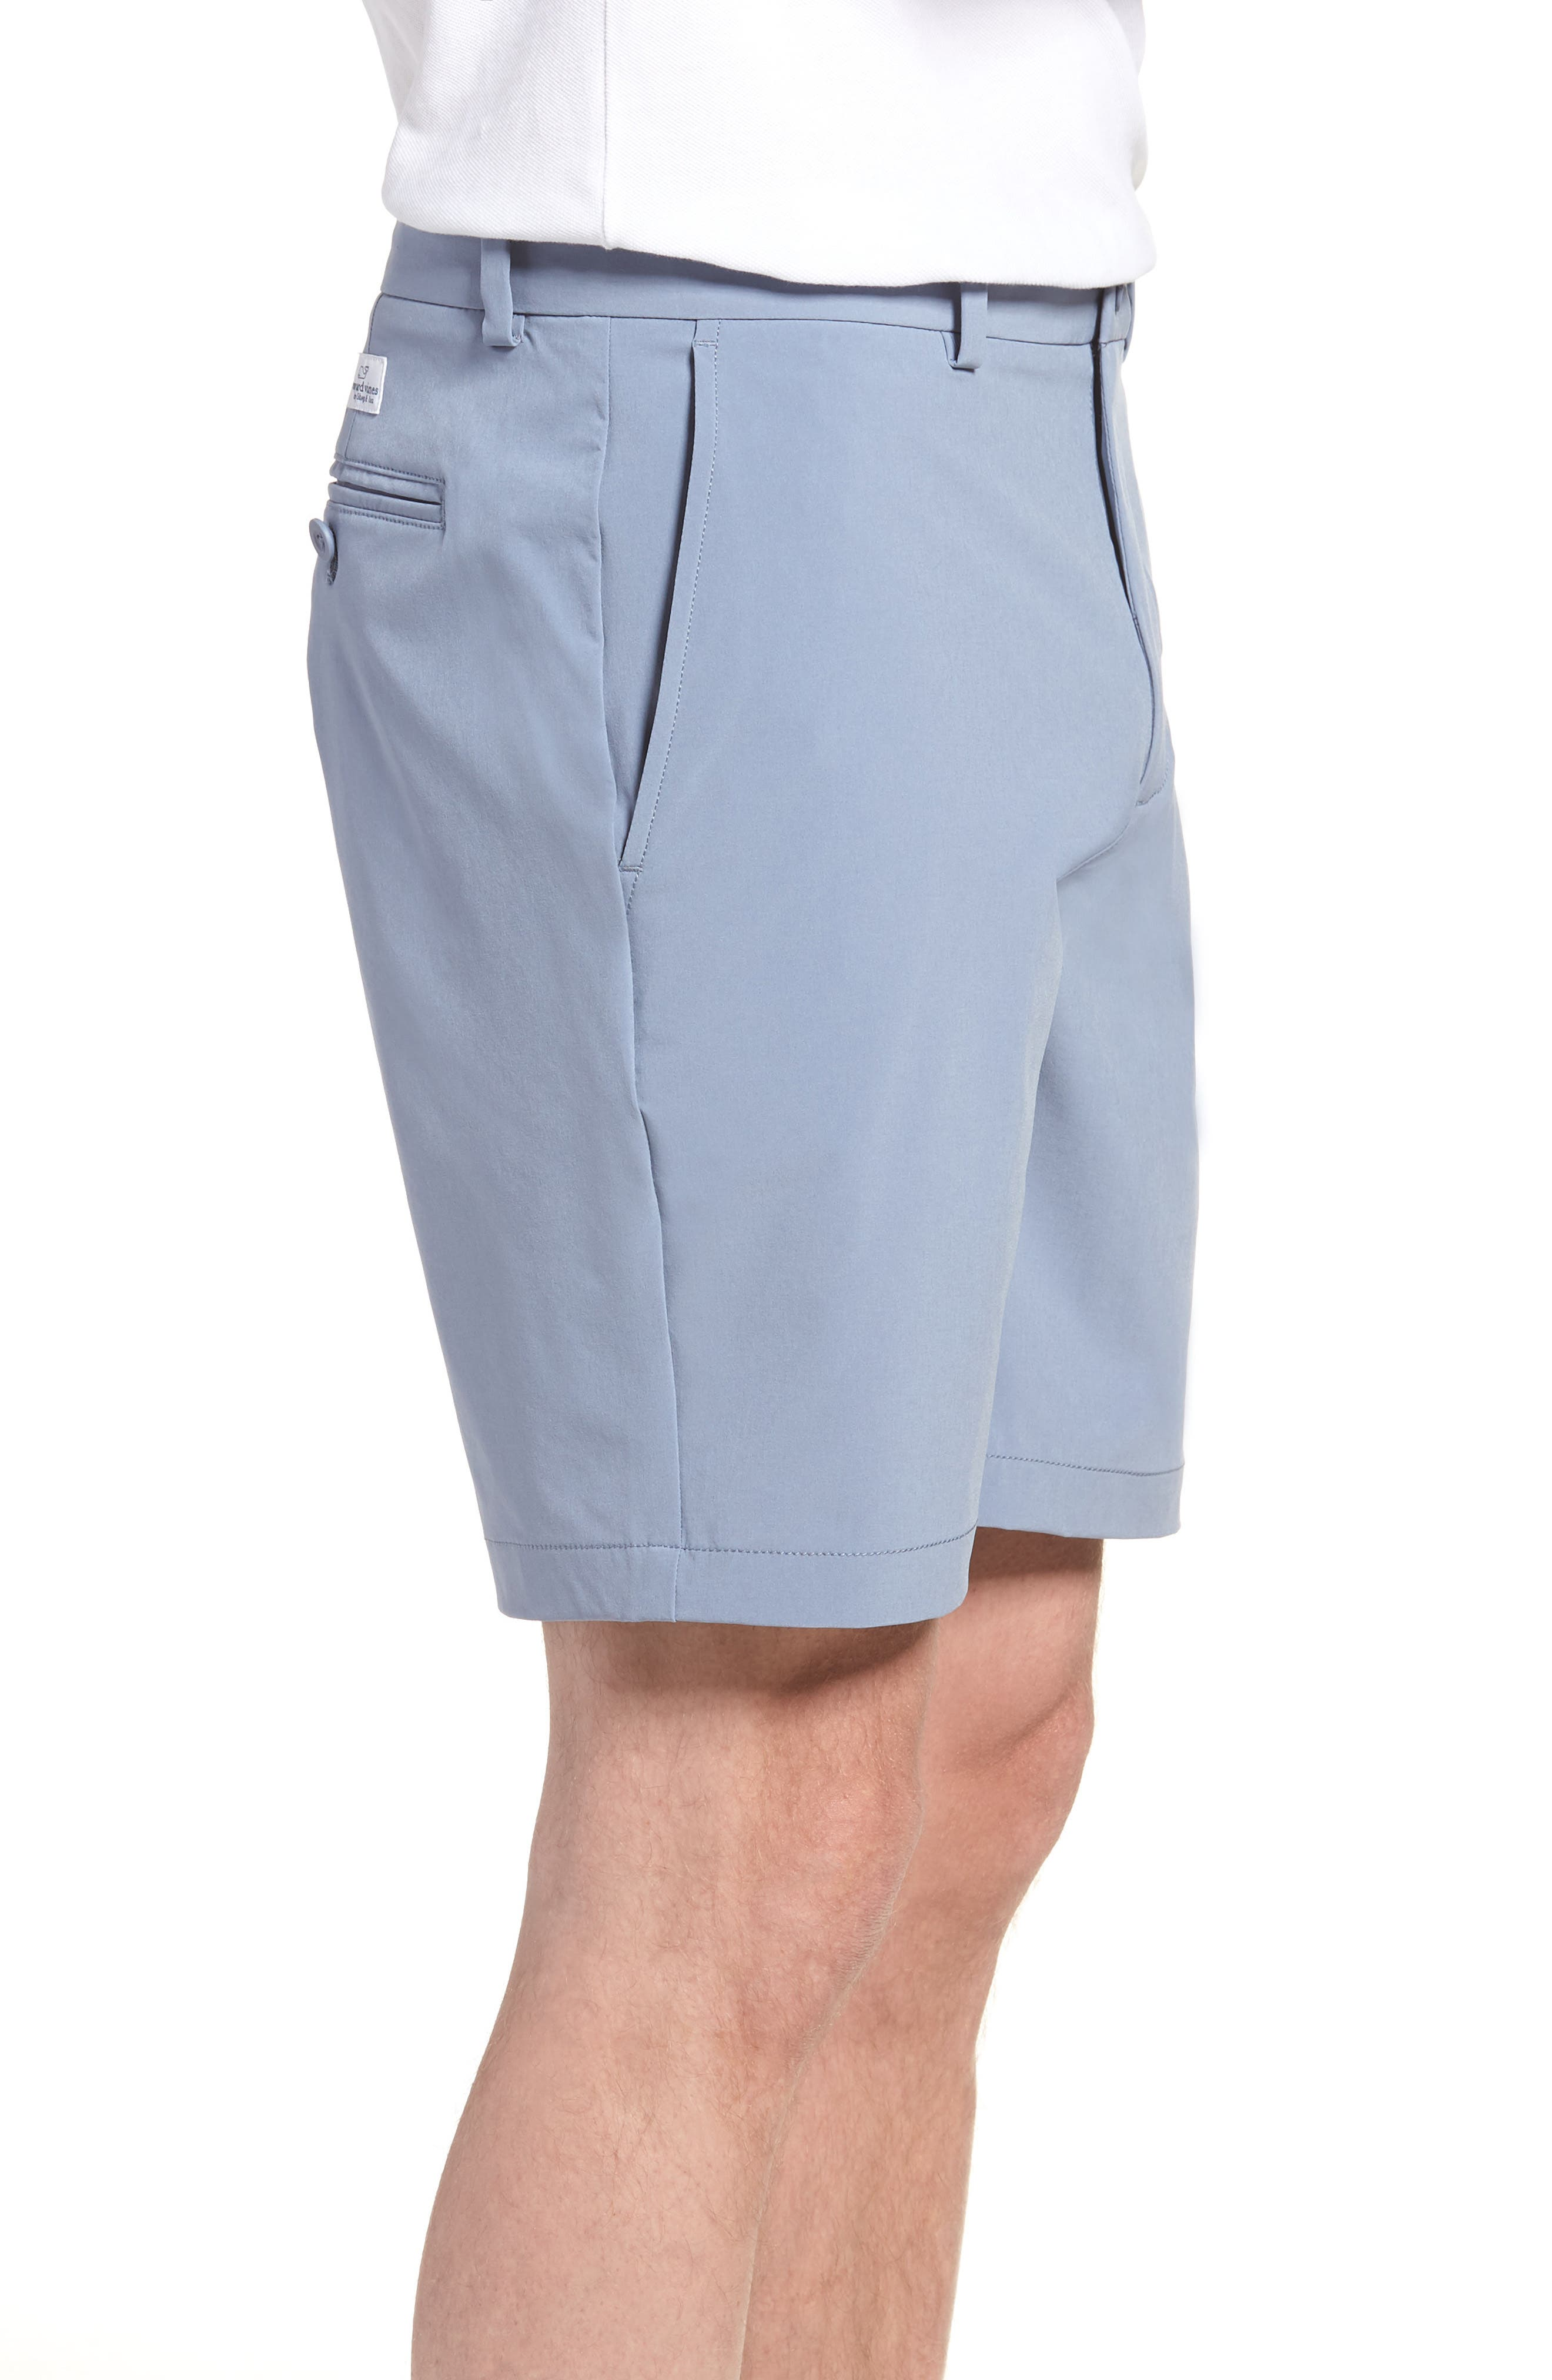 8 Inch Performance Breaker Shorts,                             Alternate thumbnail 3, color,                             423